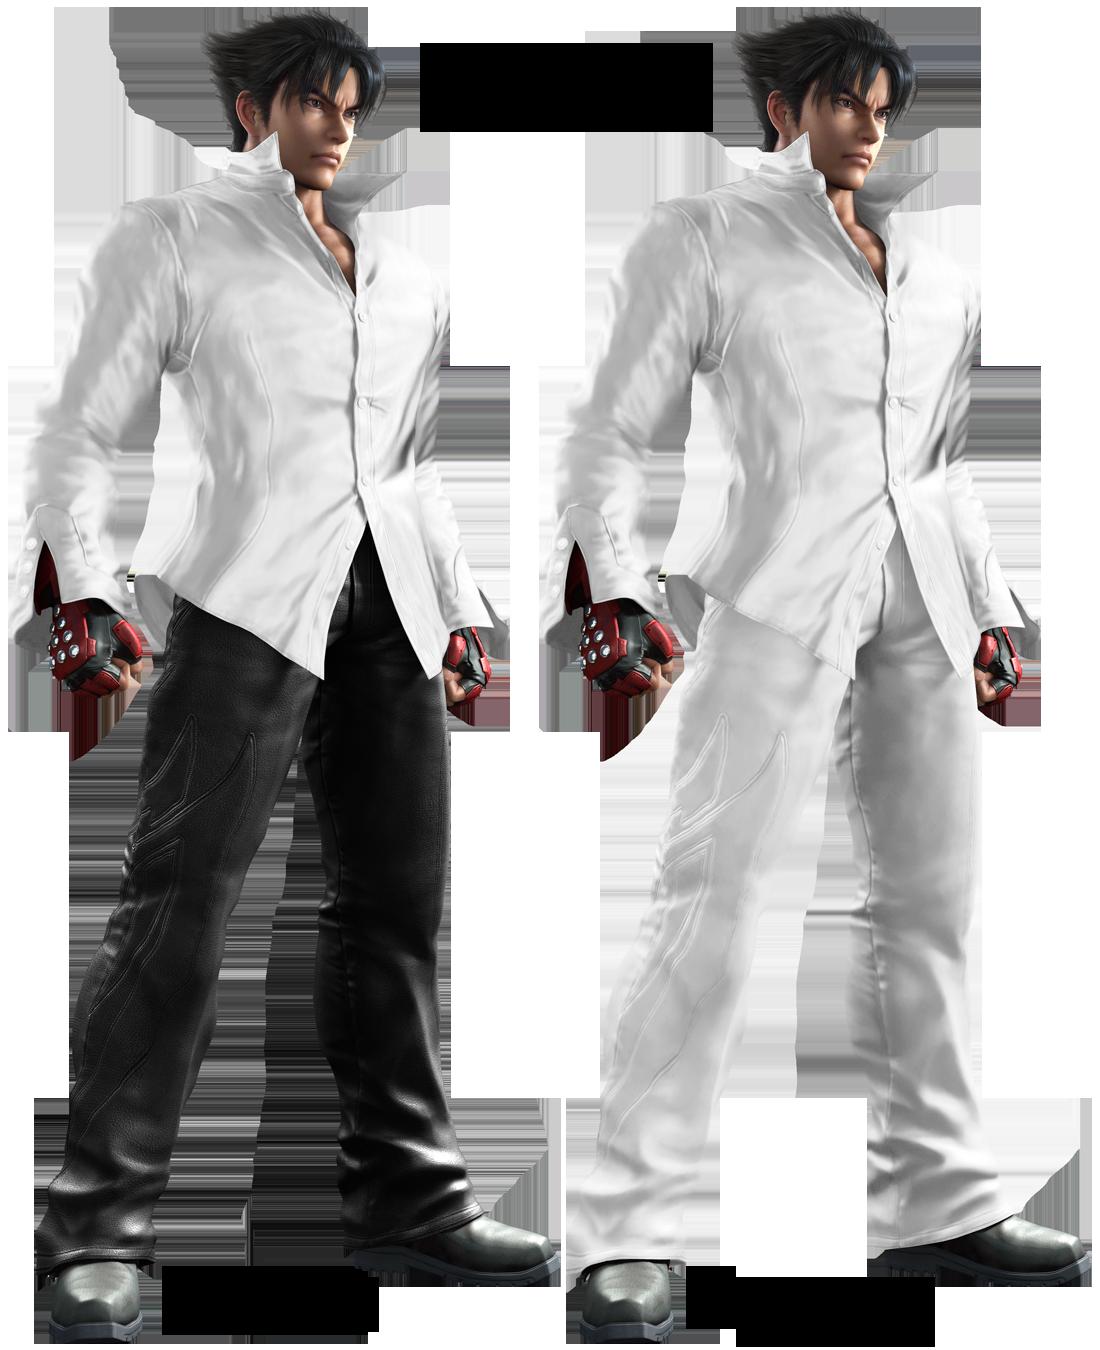 Jin Kazama White Shirt Outfit Cg By Blood Huntress On Deviantart